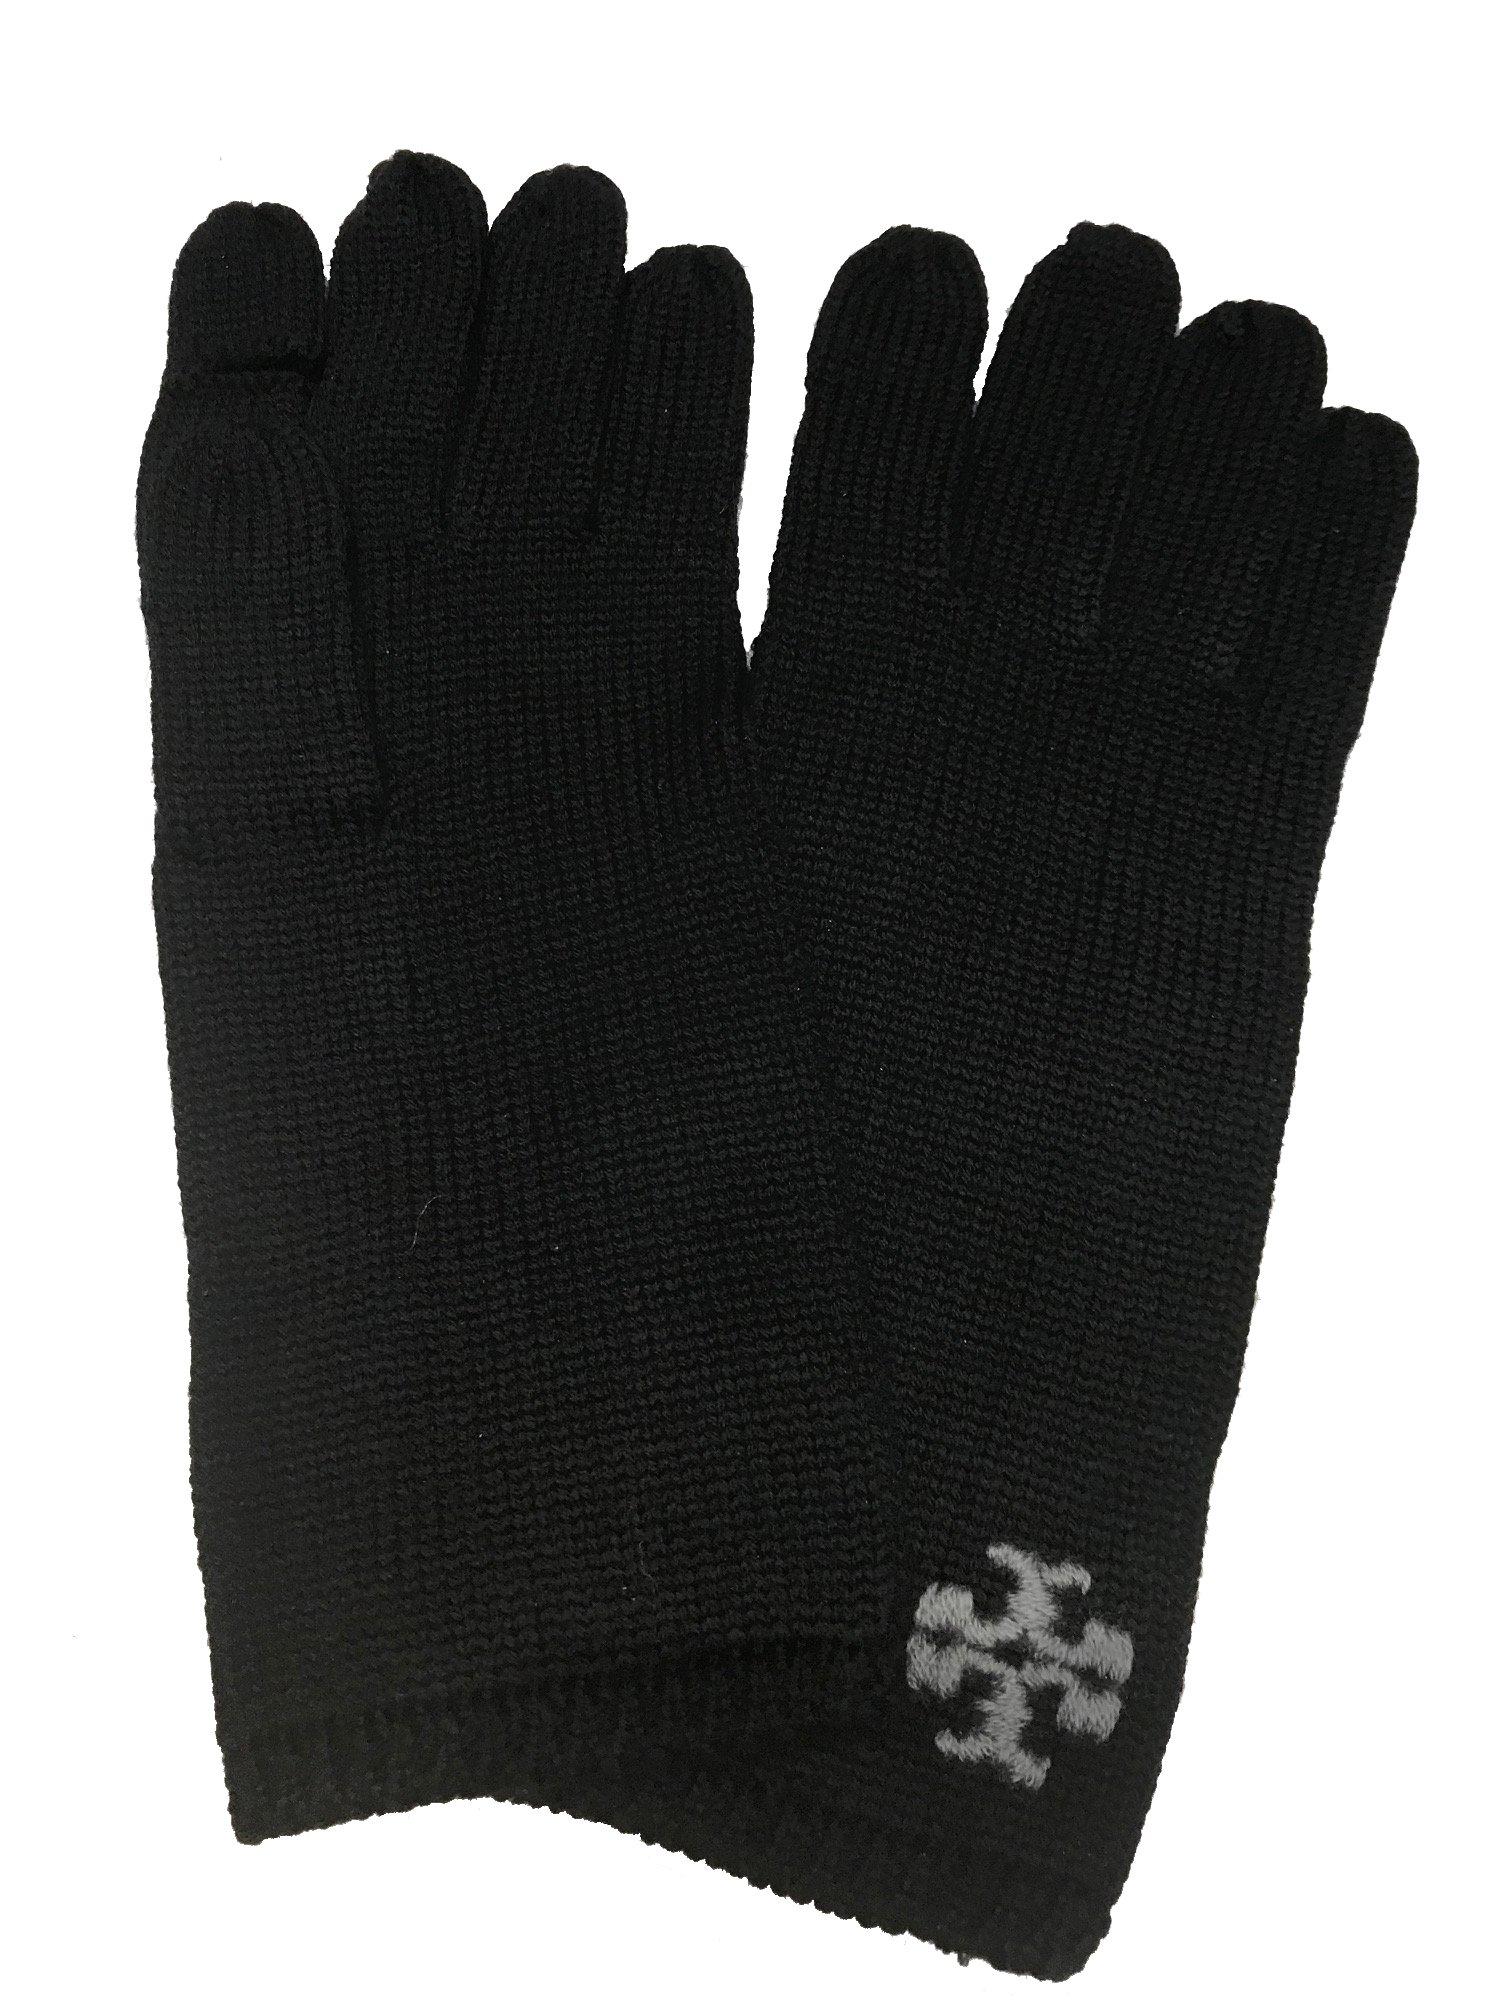 Tory Burch Womens Whipstitch Merino Wool Gloves Black